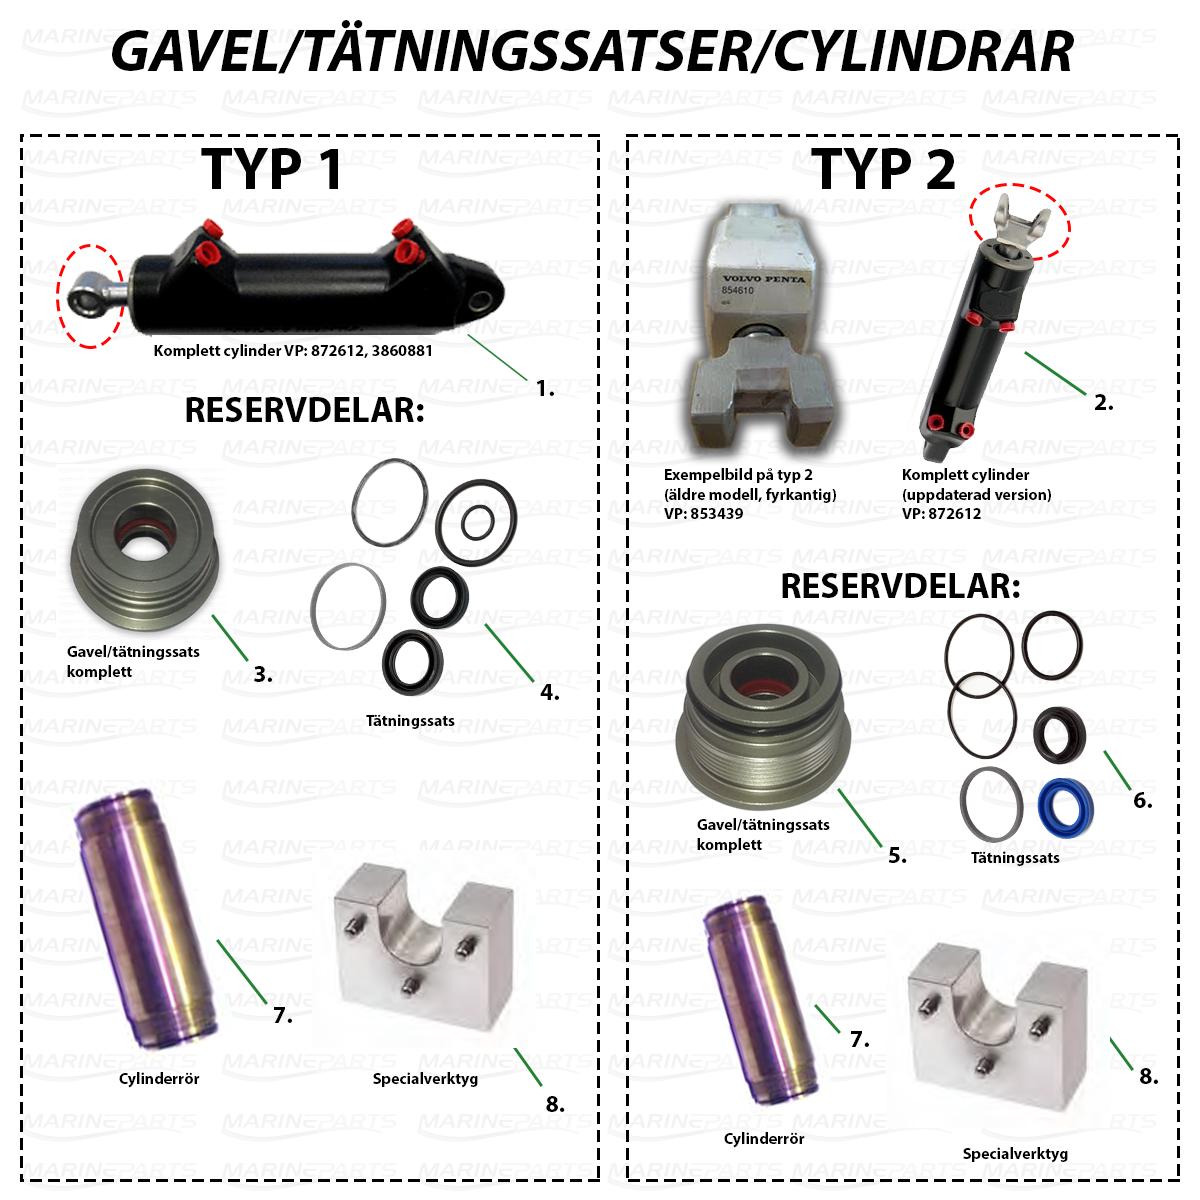 Reservedeler for trimsylinder for Volvo Penta AQ-serien